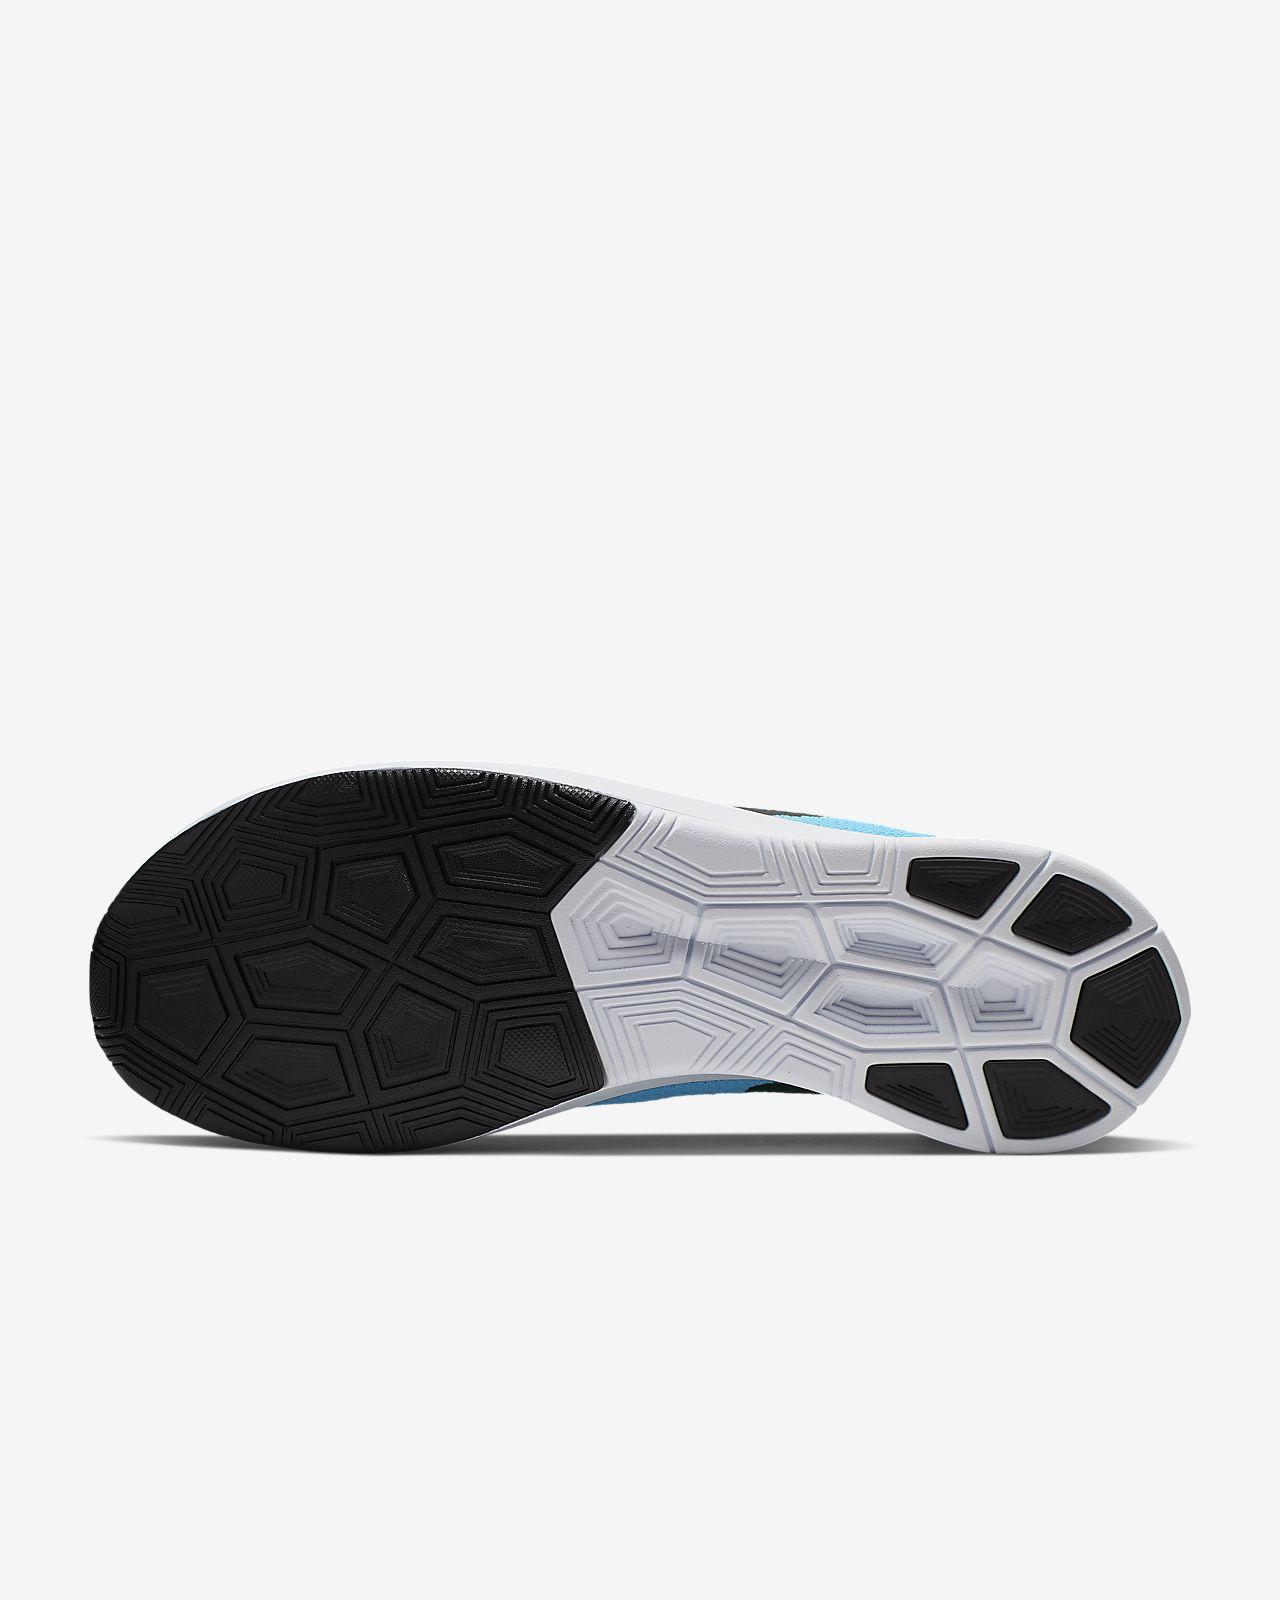 separation shoes e9a83 6b907 ... Nike Zoom Fly Flyknit Men s Running Shoe